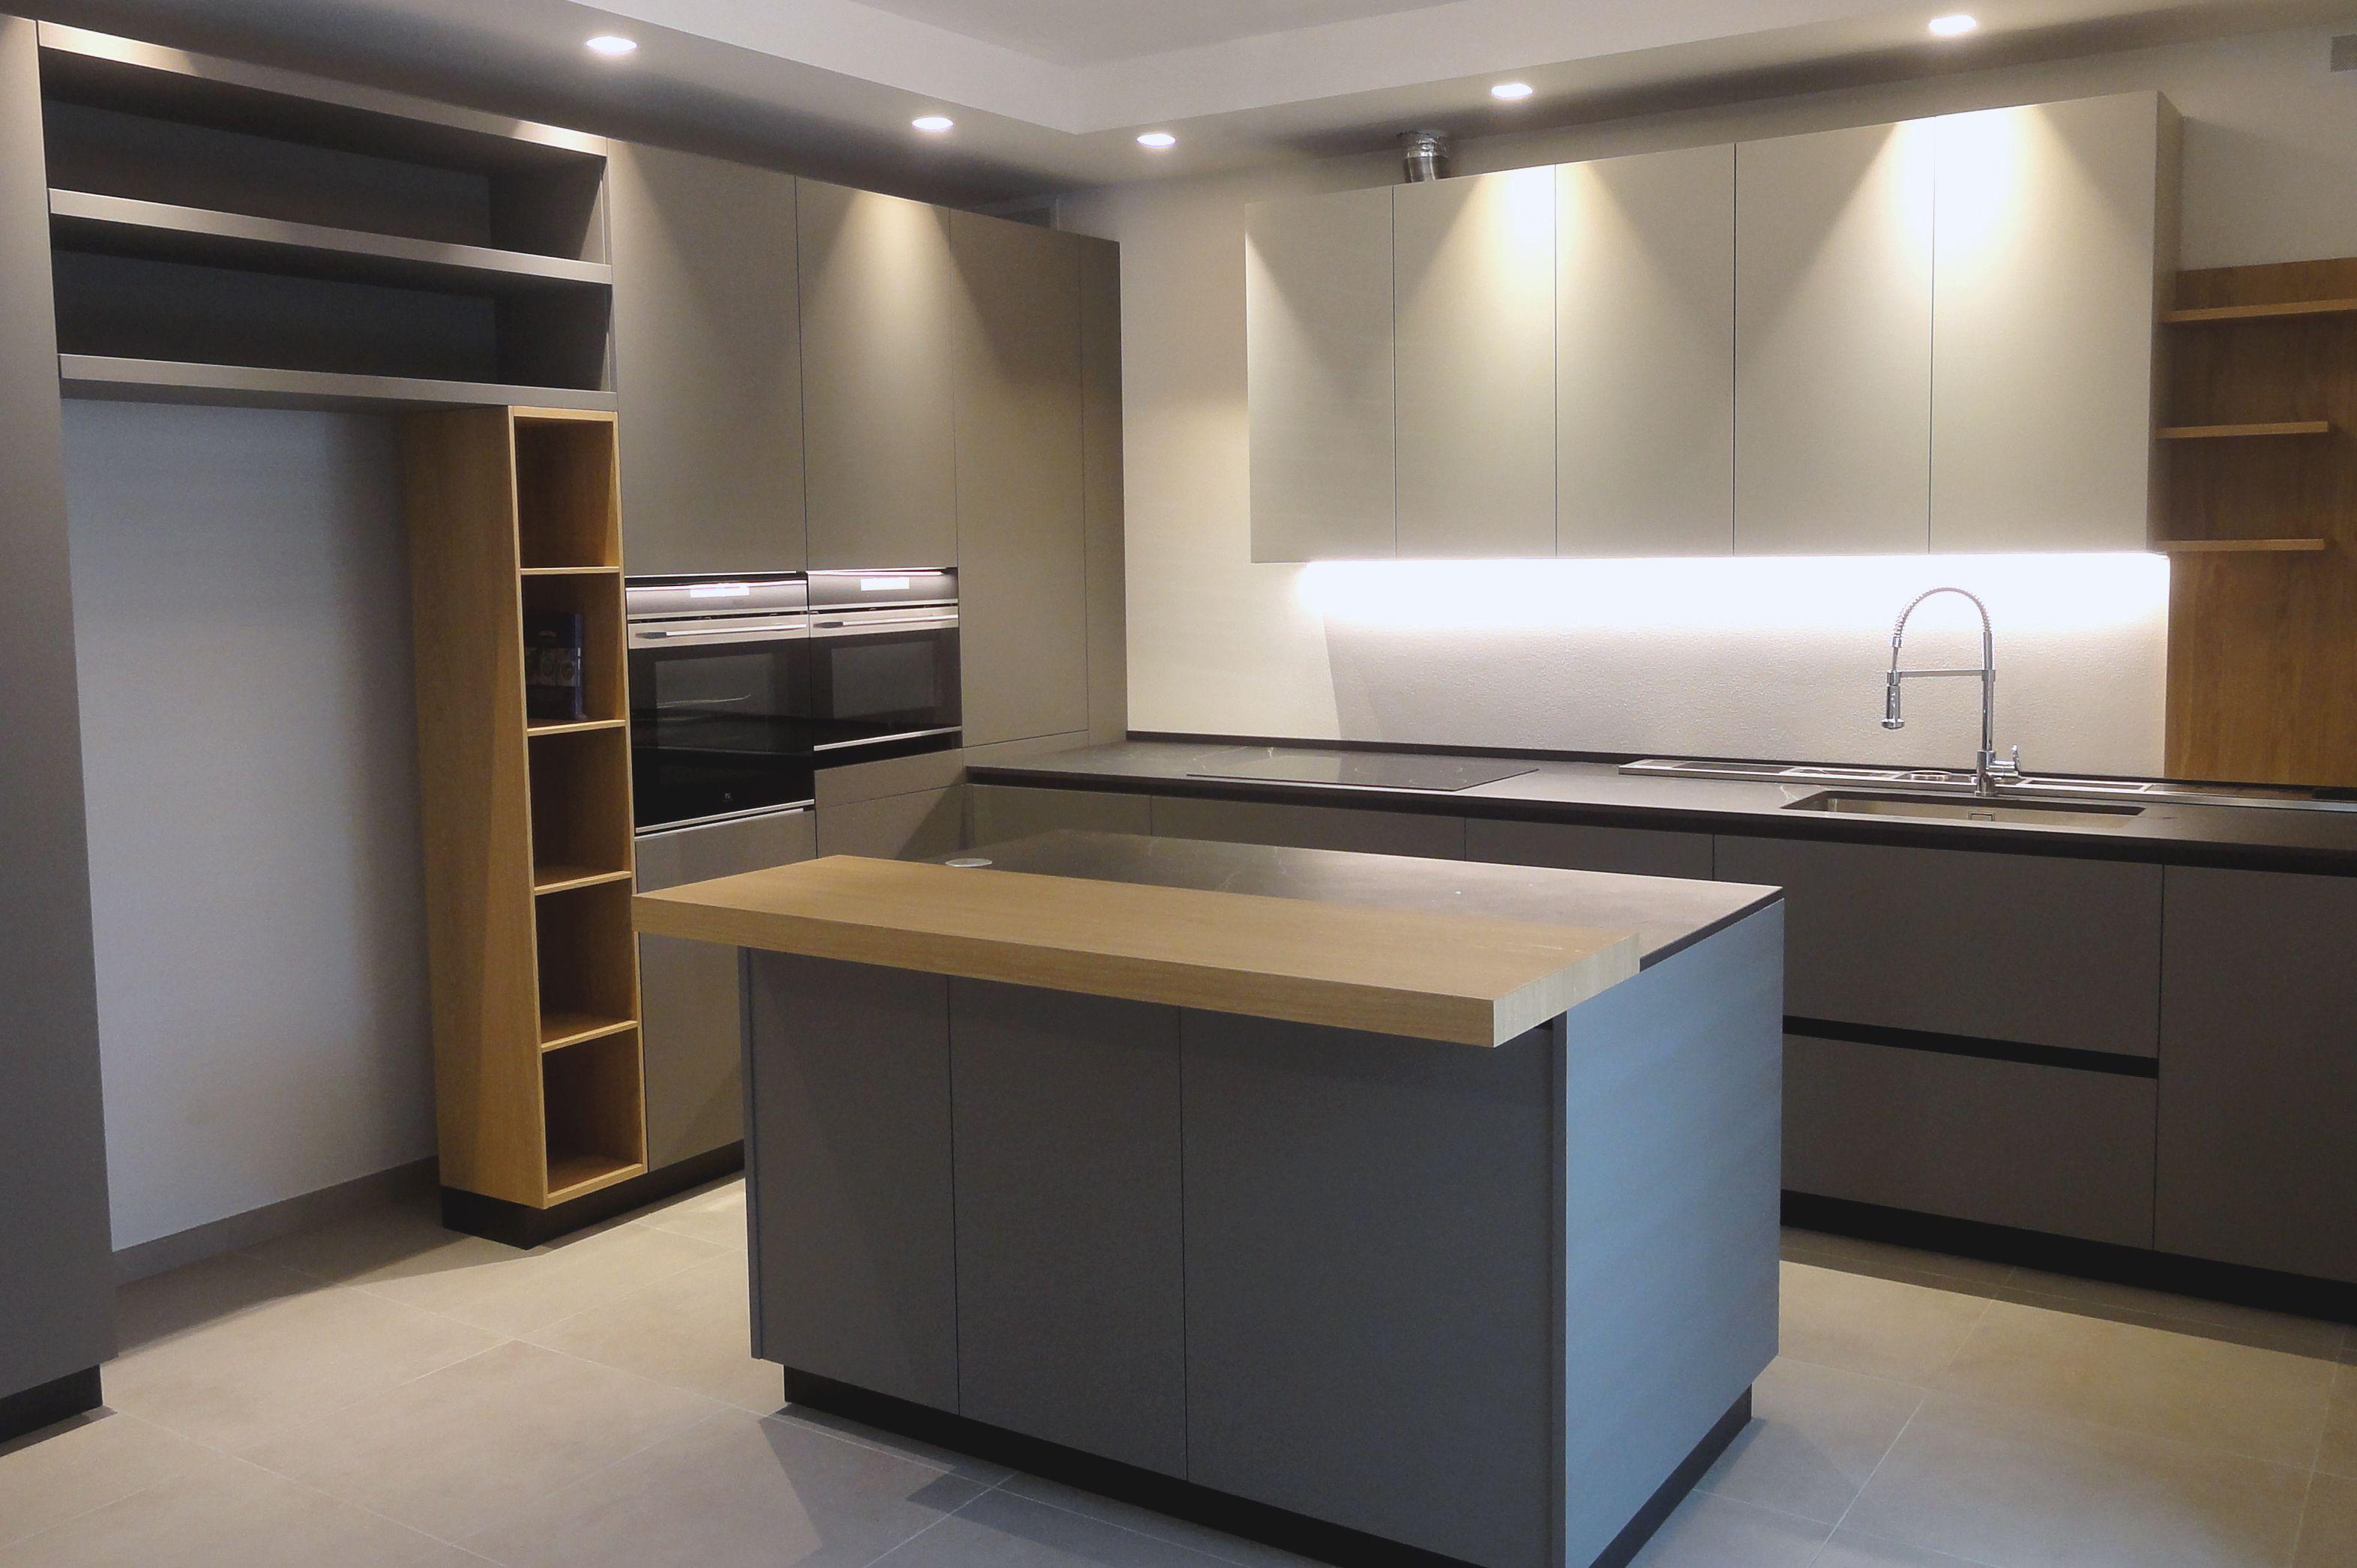 Pin Di Binova Su Your Binova Kitchens Arredo Interni Cucina Arredamento Interni